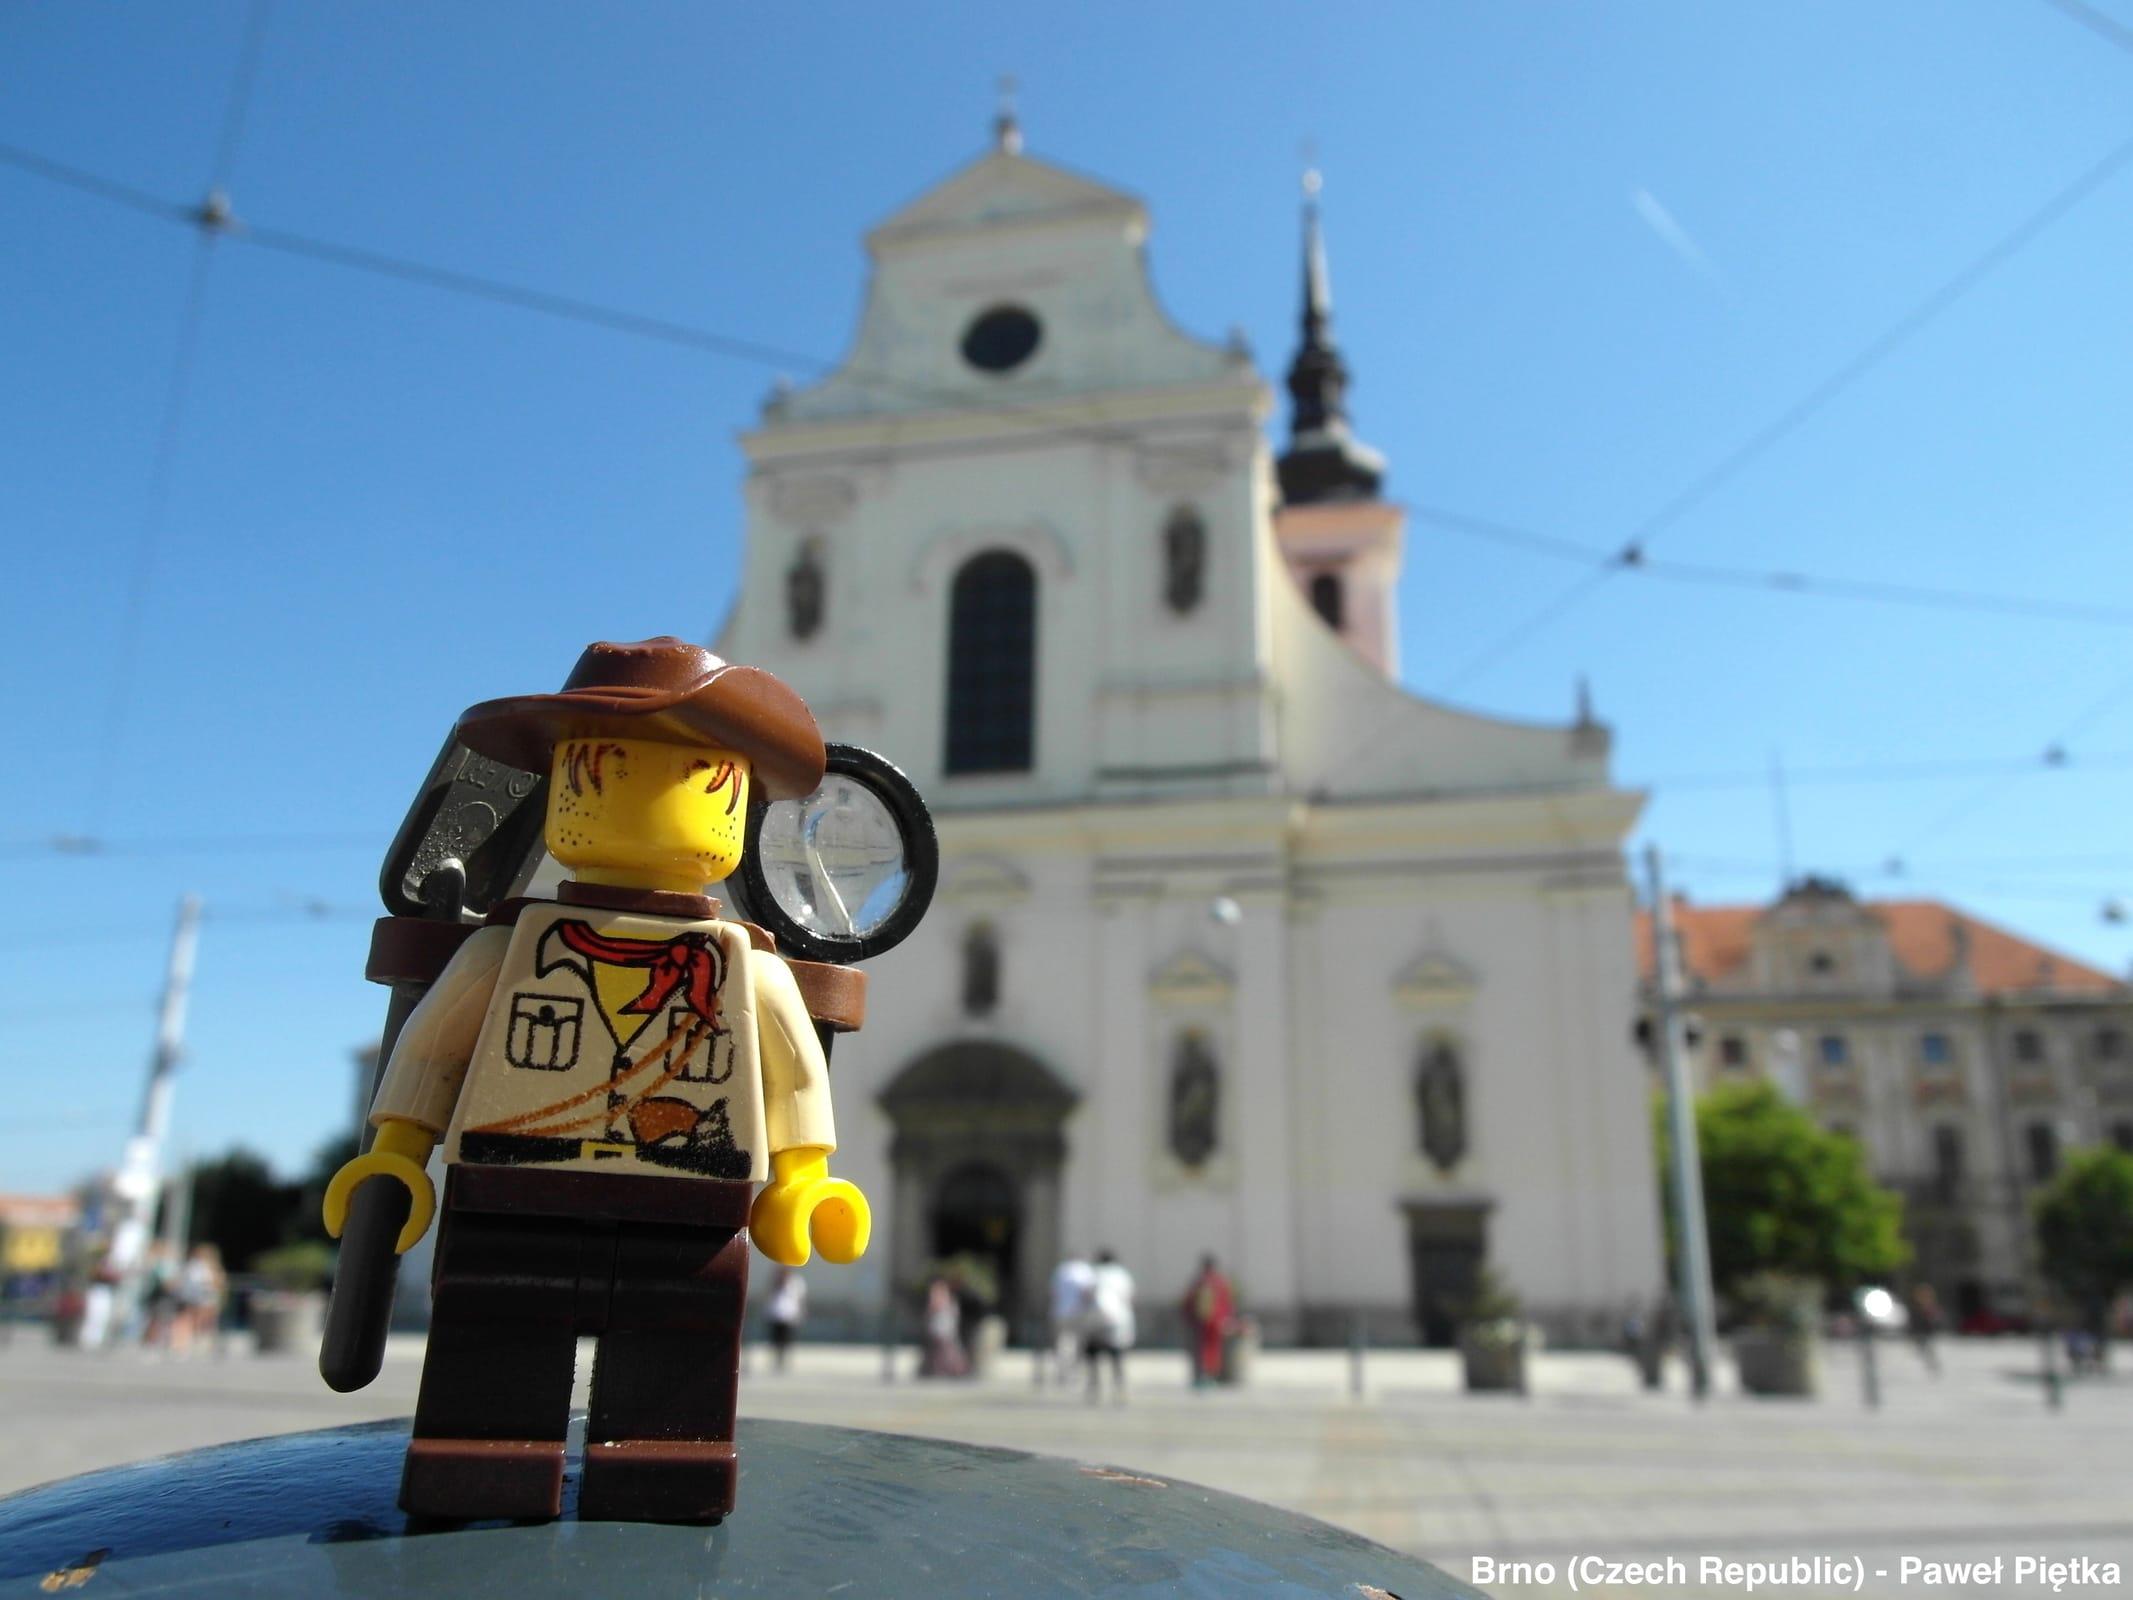 Brno (Czech Republic) - Church of St Thomas